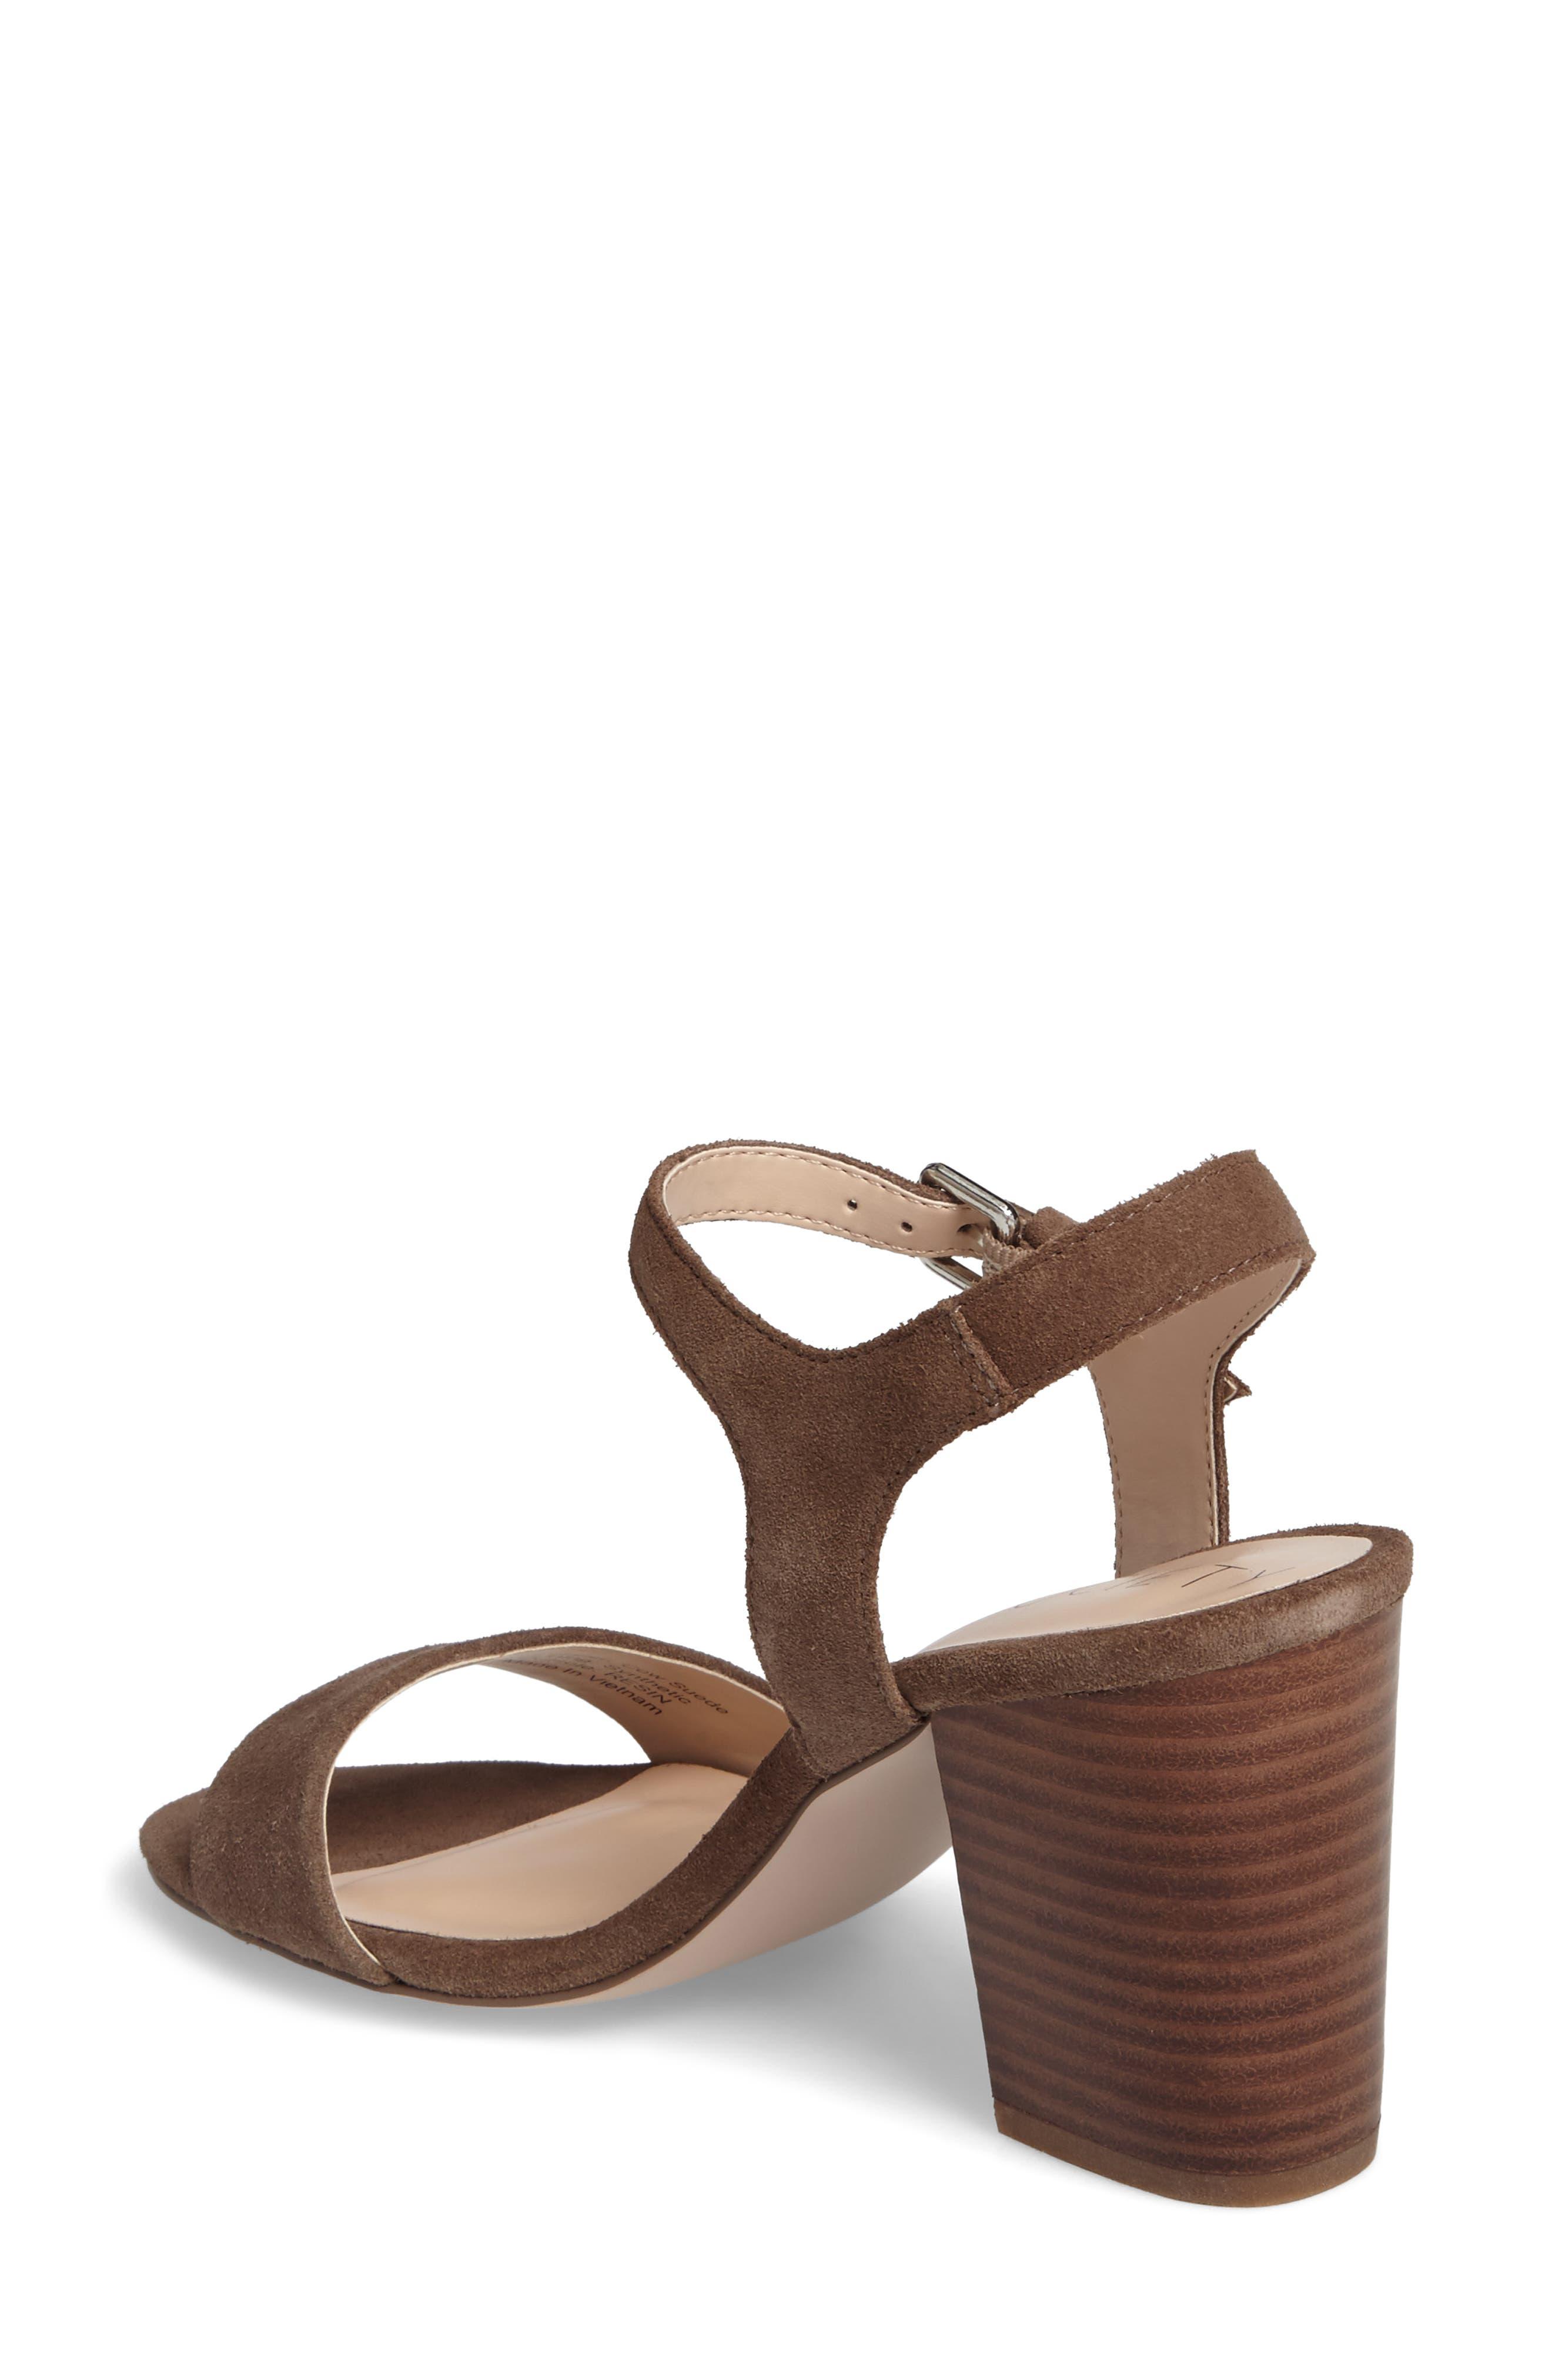 'Linny' Ankle Strap Sandal,                             Alternate thumbnail 7, color,